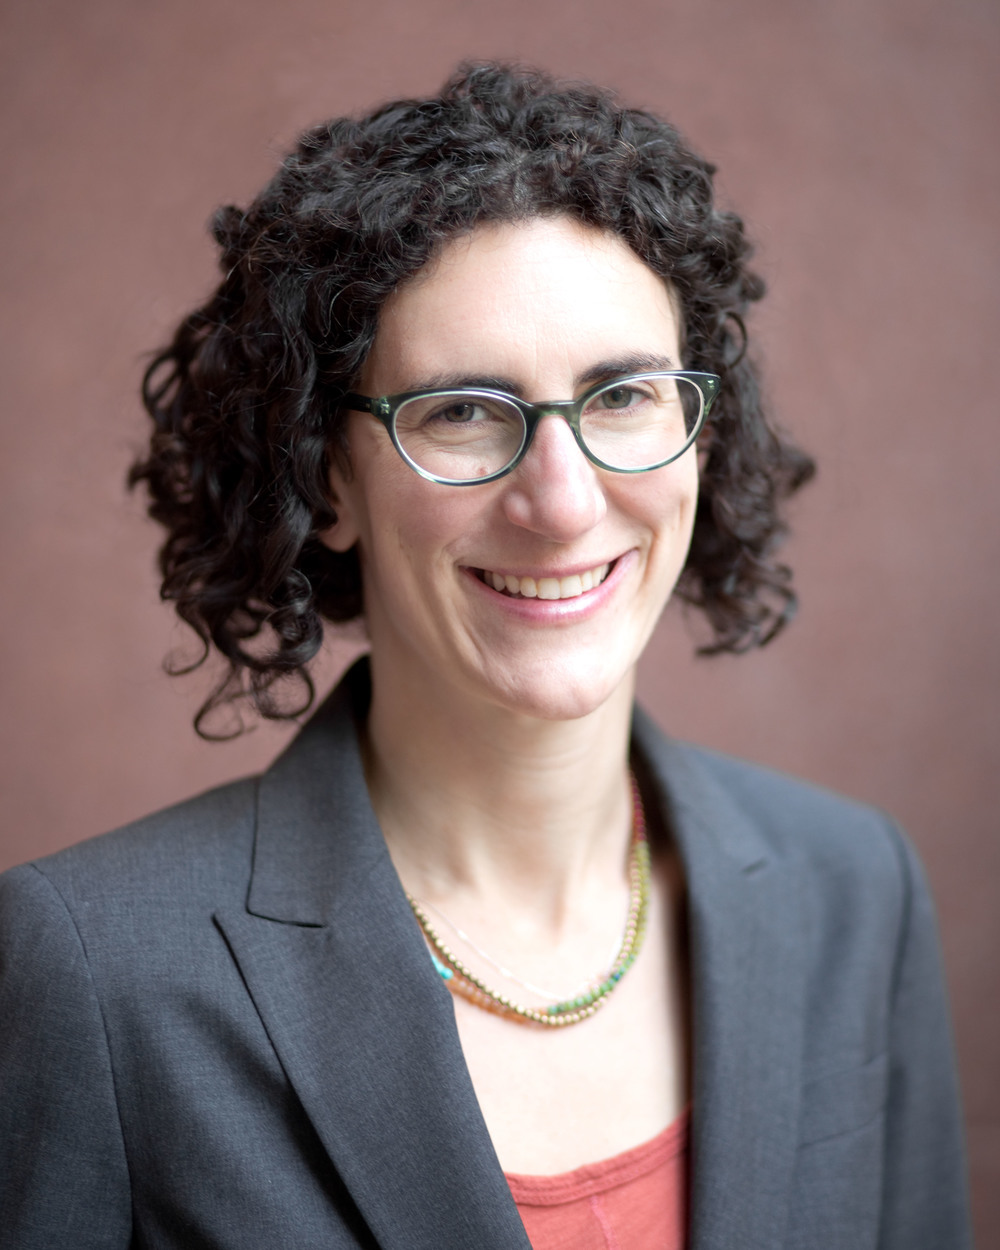 Palestine Legal Staff Attorney Liz Jackson